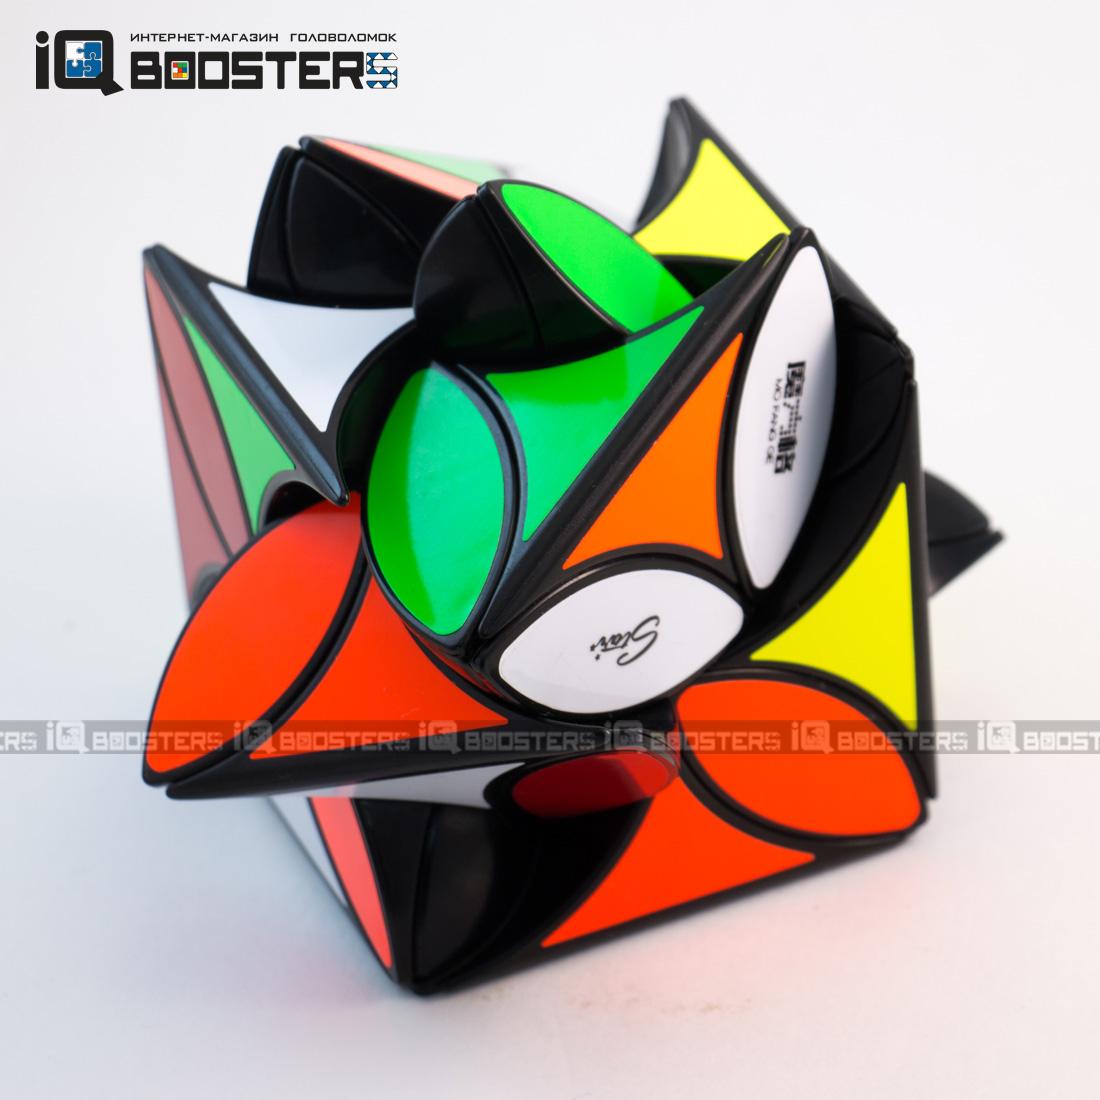 qiyi_clover_cube_b7